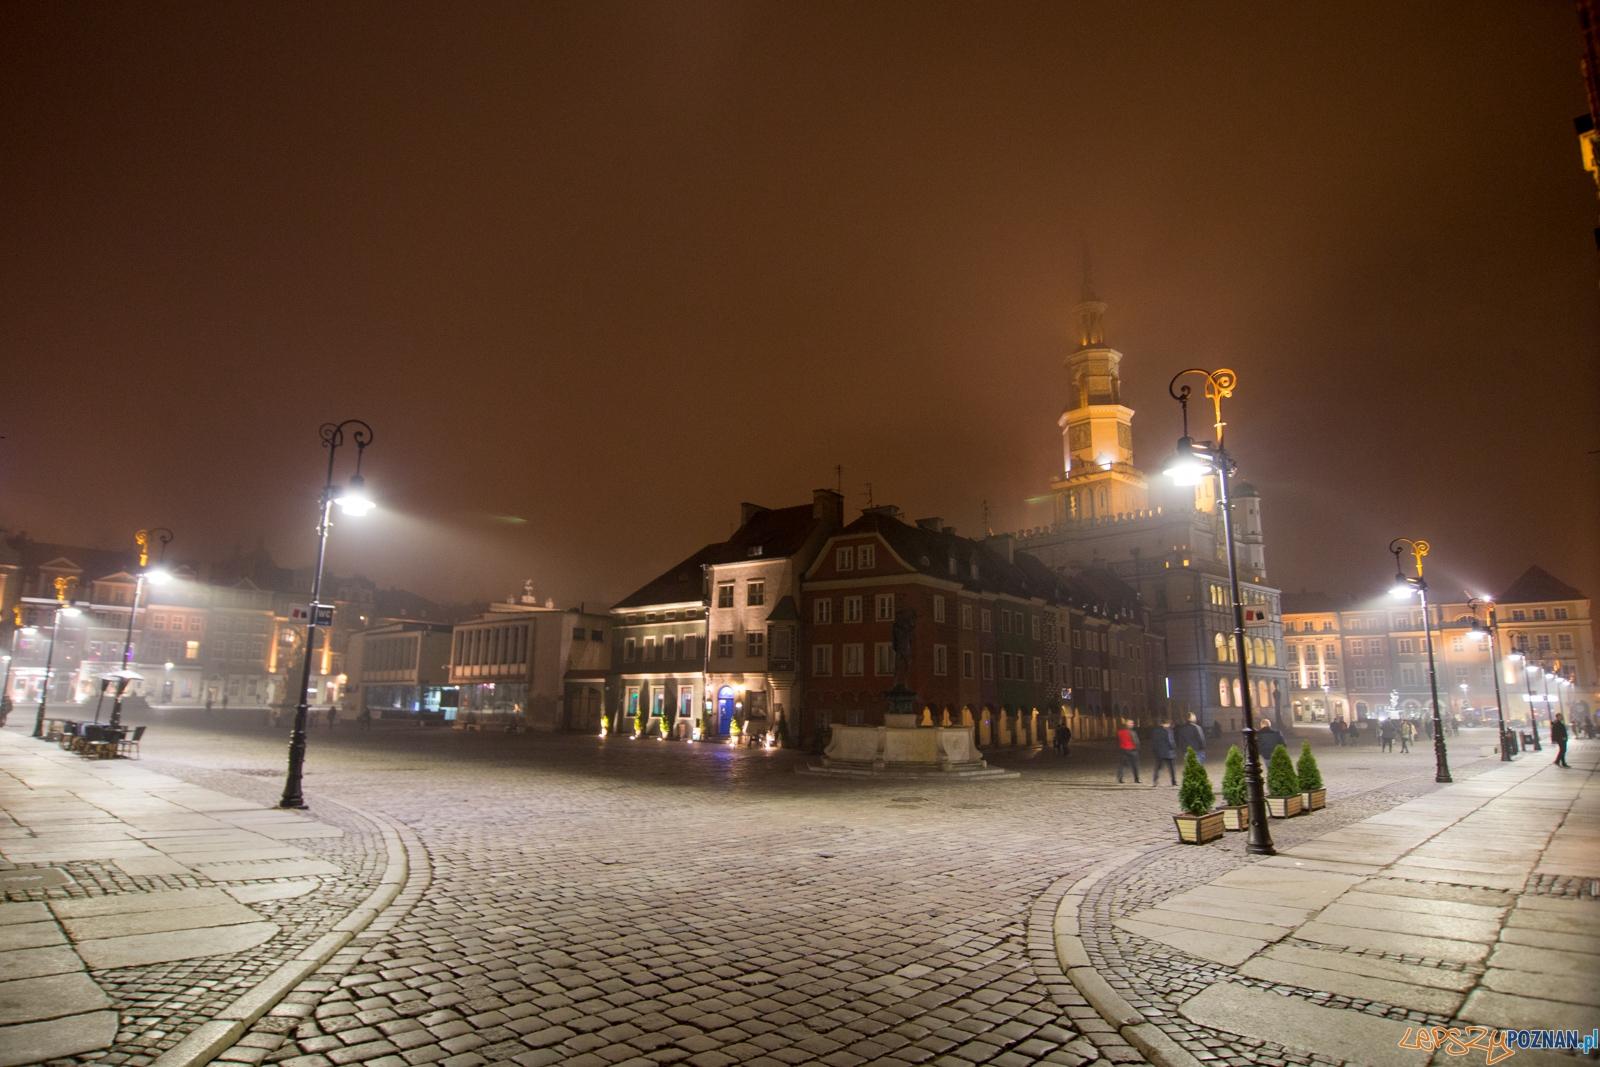 Ledowy Stary Rynek  Foto: lepszyPOZNAN.pl / Piotr Rychter